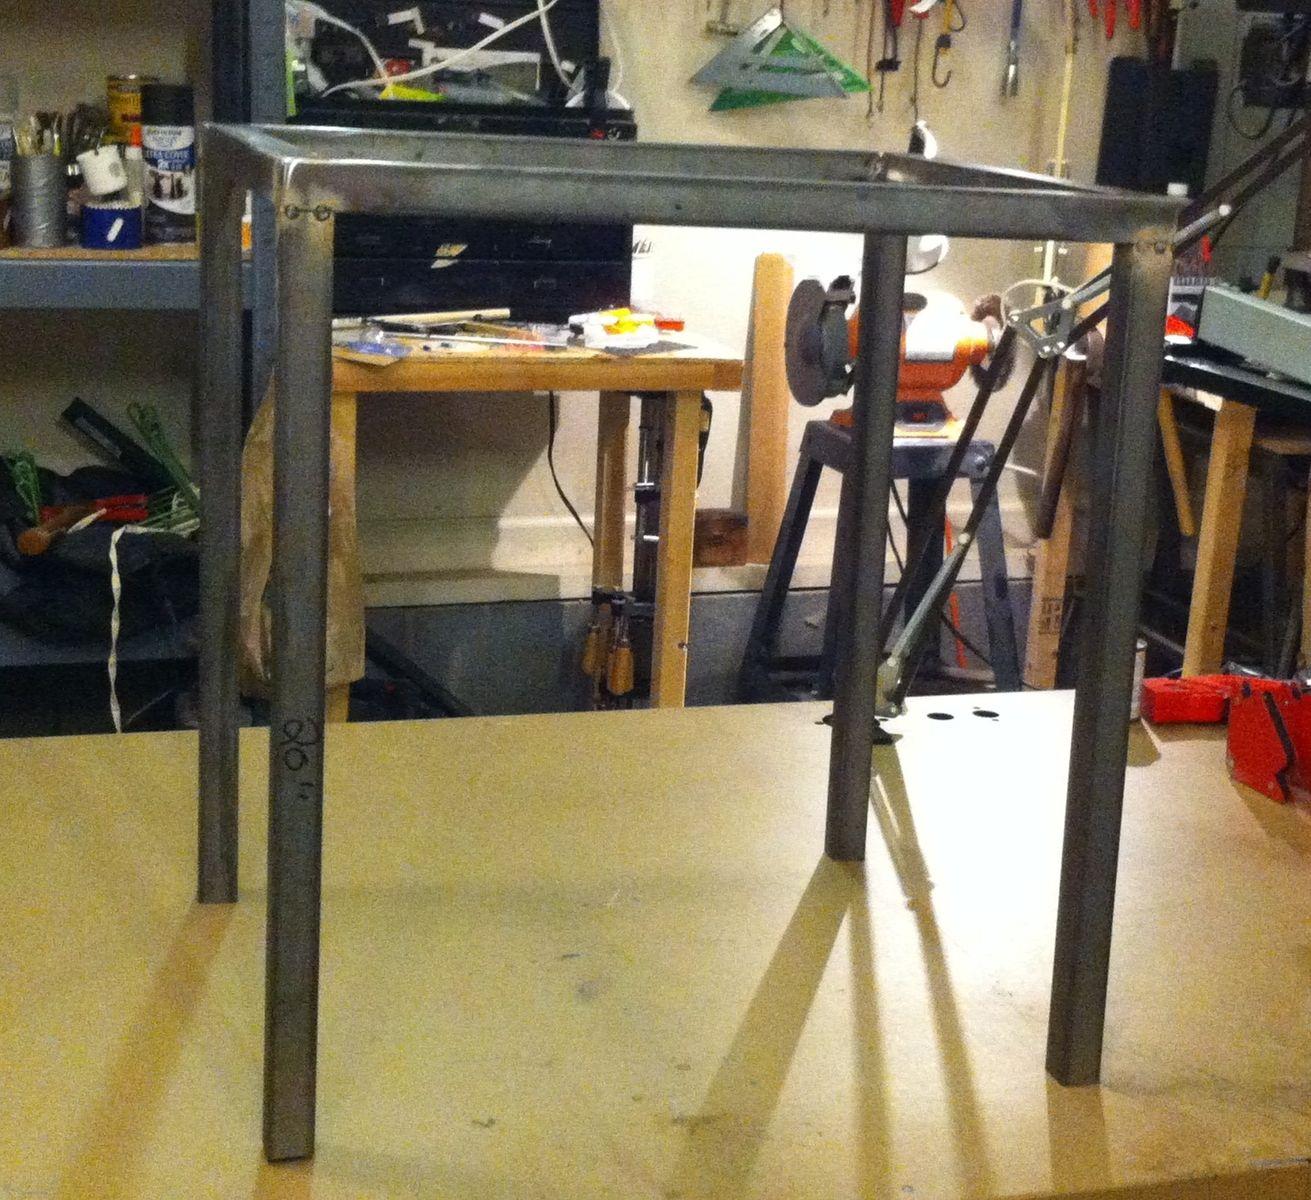 Fullsize Of Mini Fridge Stand